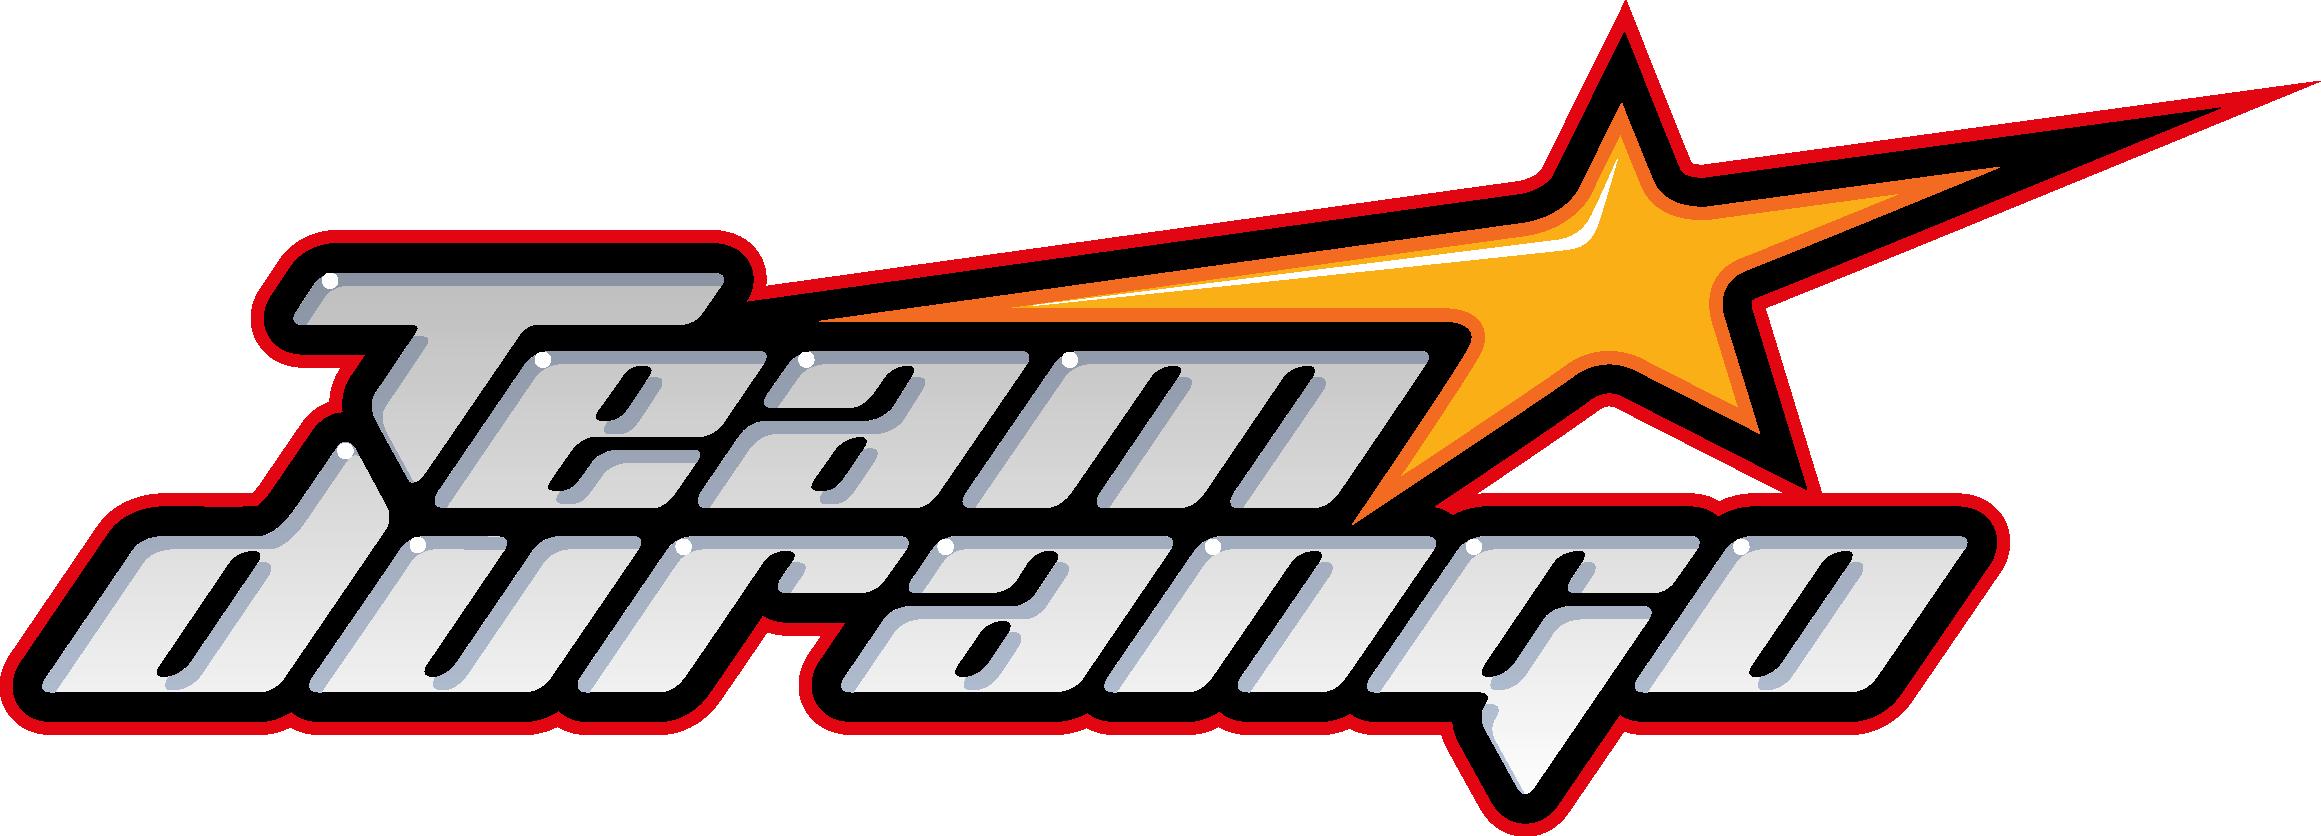 Team Logo Clipart Best